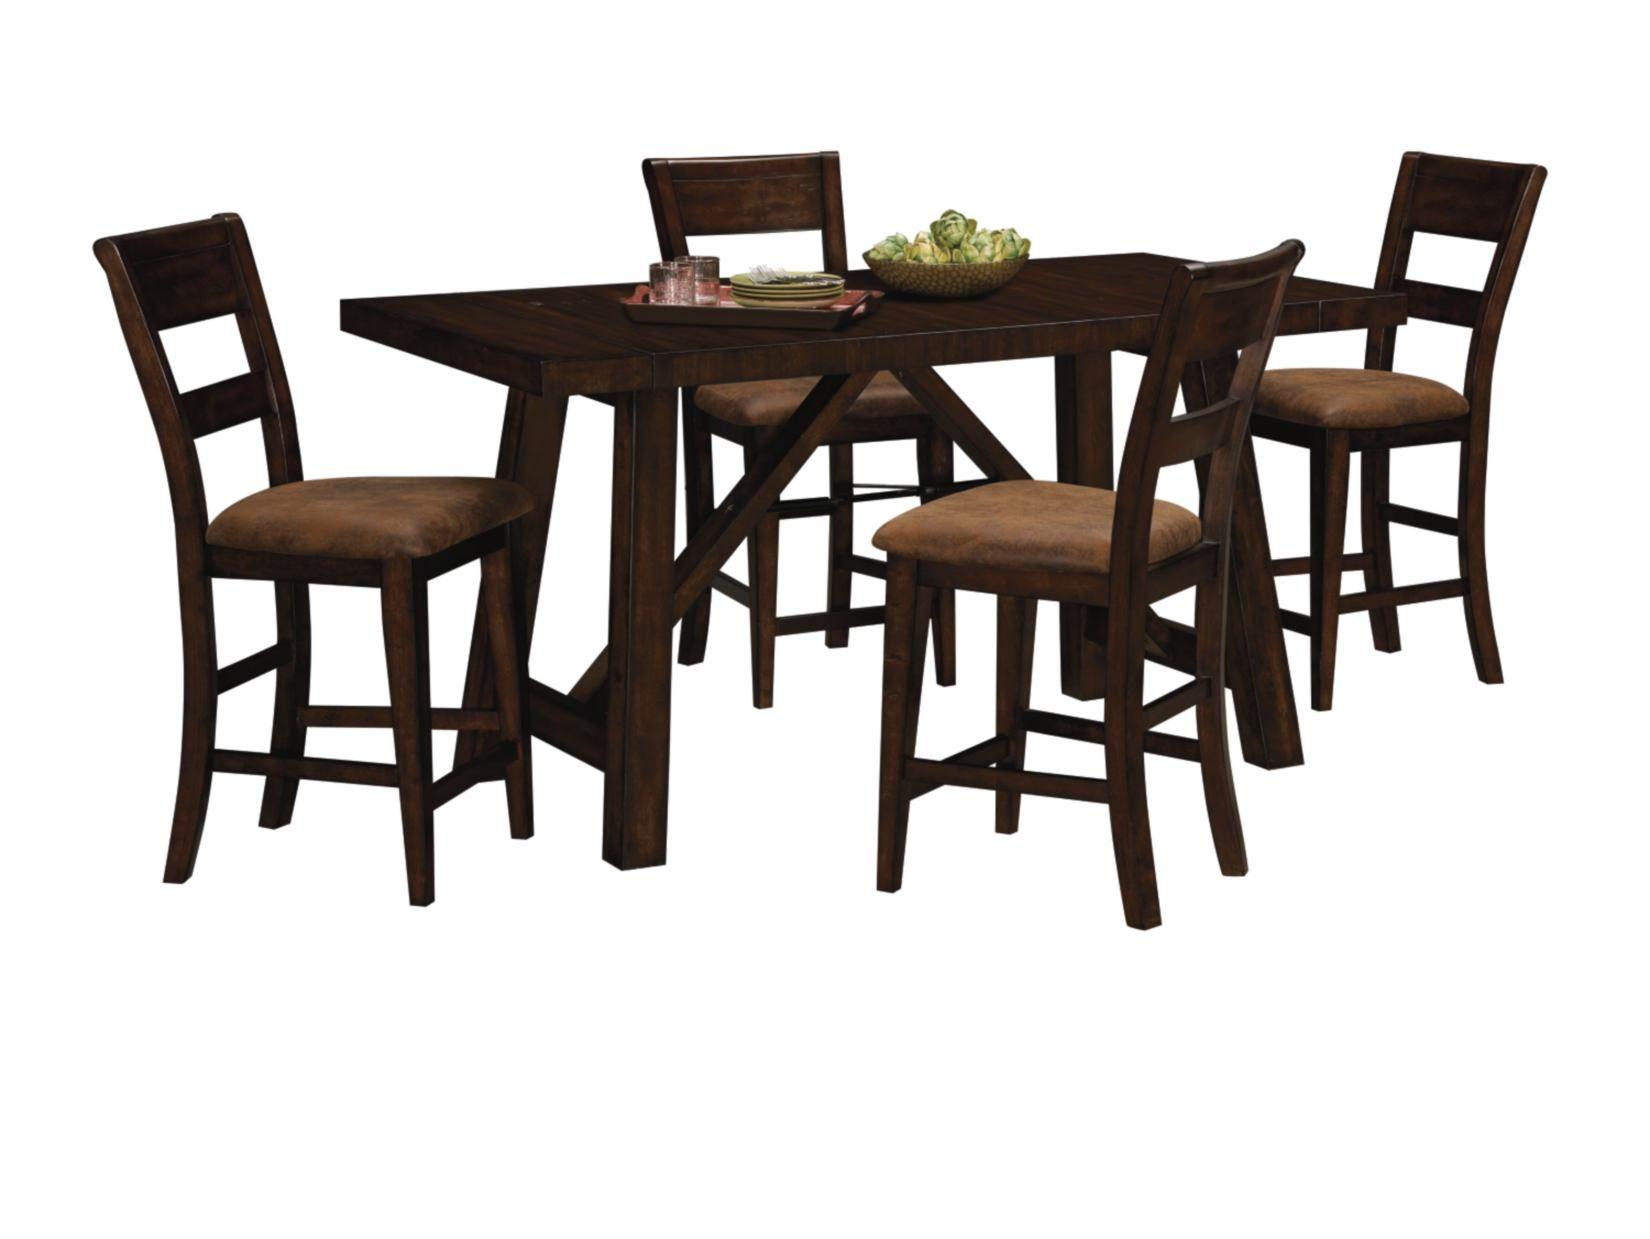 Everett Counter Height Table   Value City Furniture #VCFwishlist